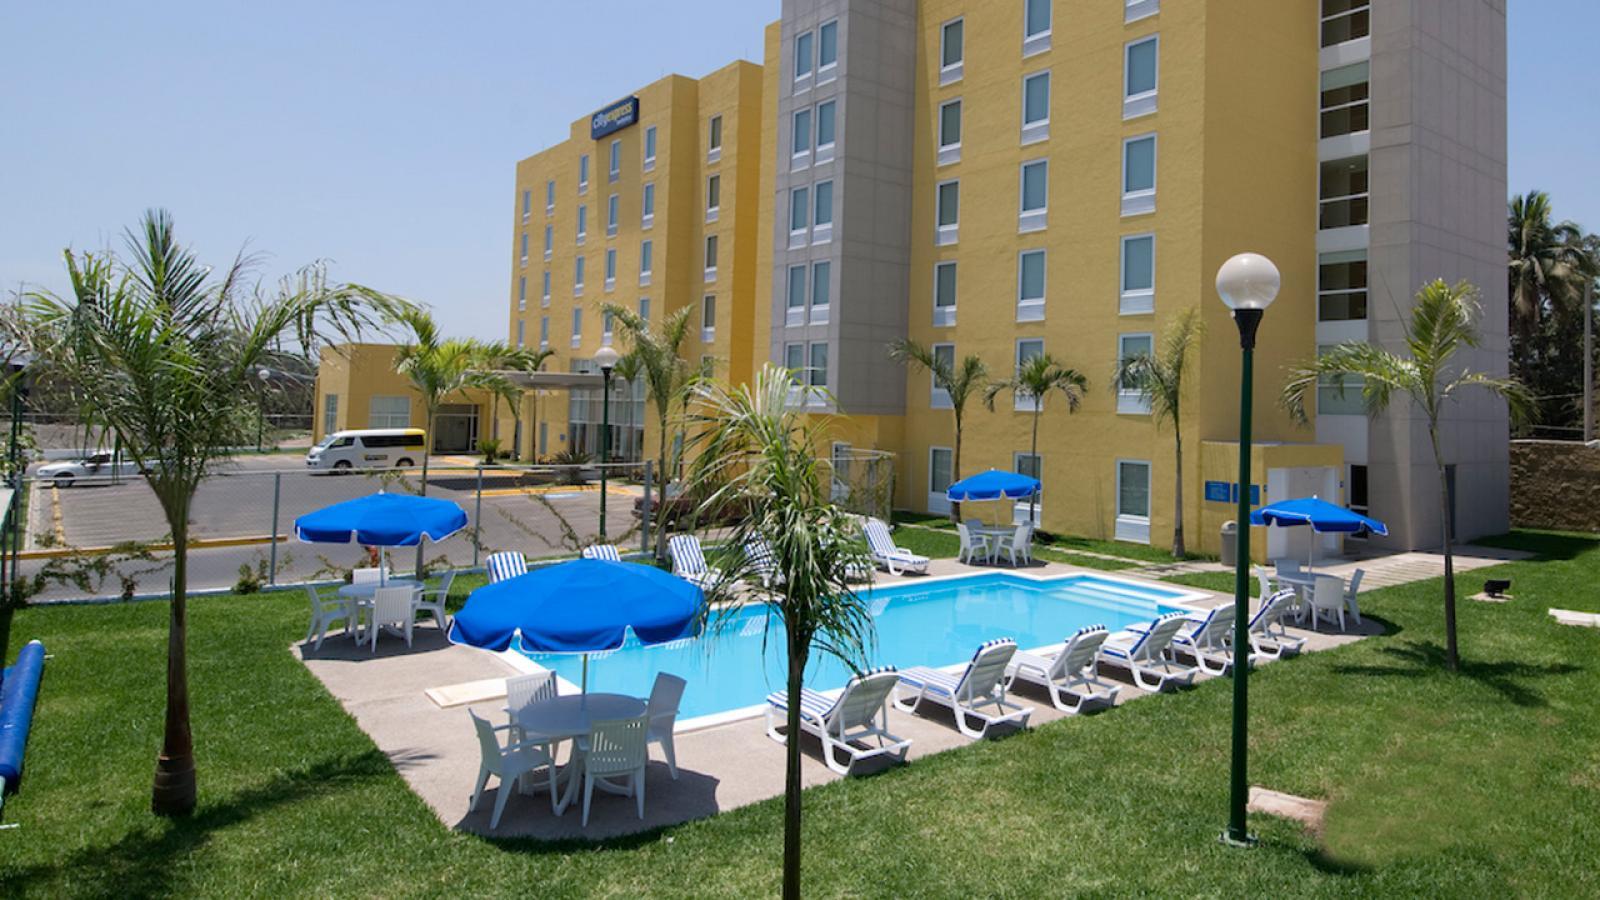 City Express Lzaro Rdenas Hoteles